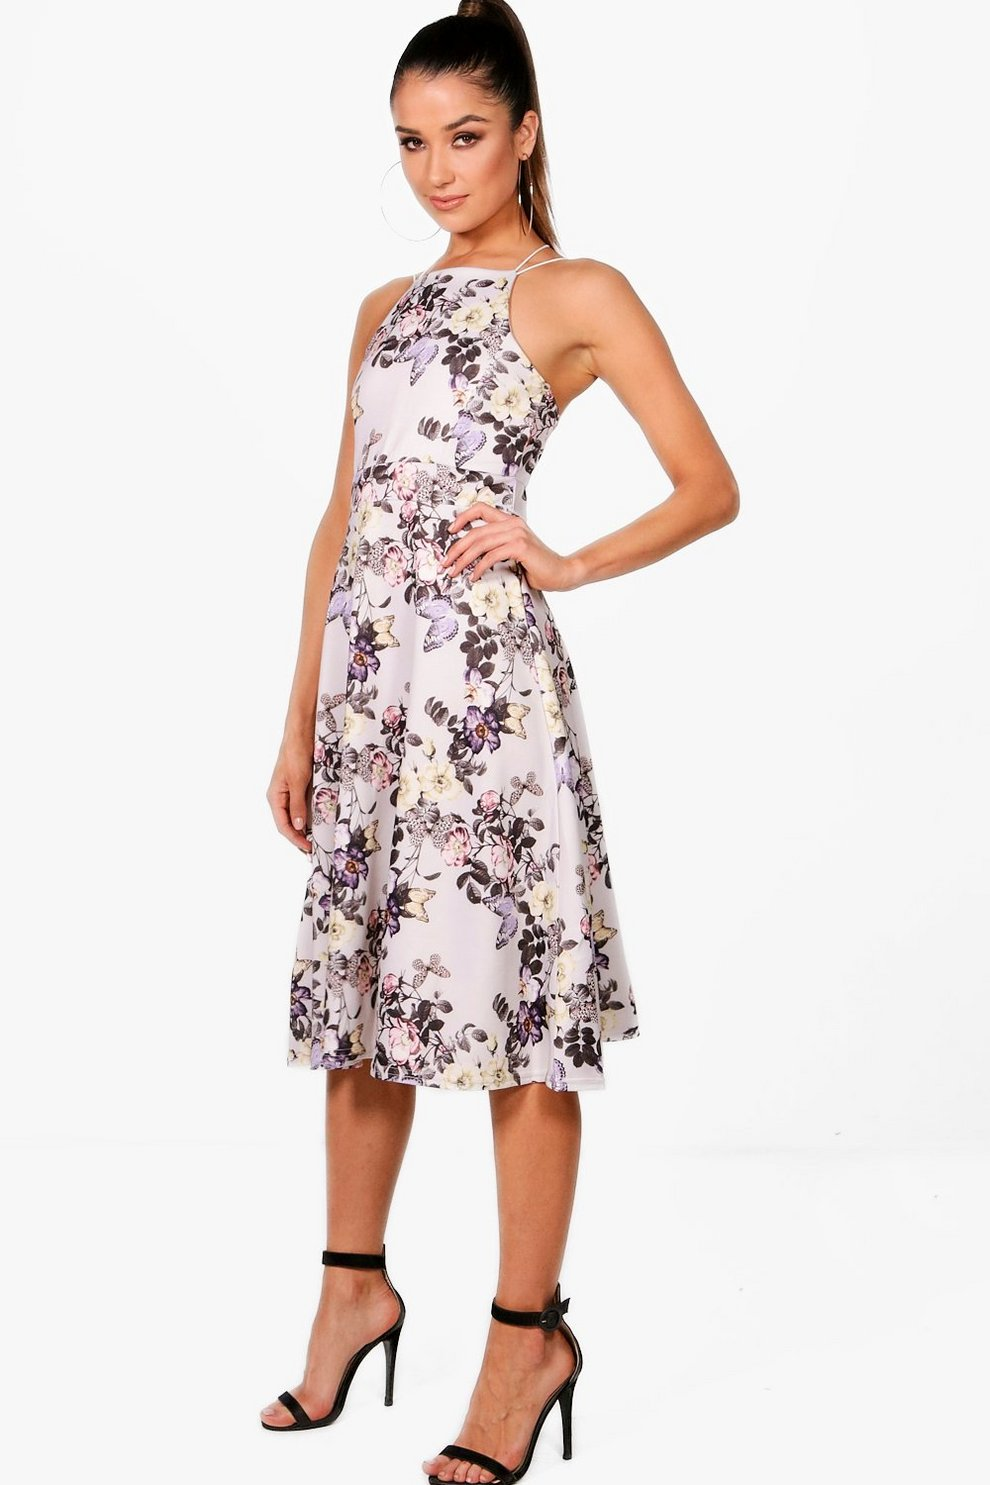 64c5ce9d0666 Rebecca Floral Strappy Midi Skater Dress | Boohoo